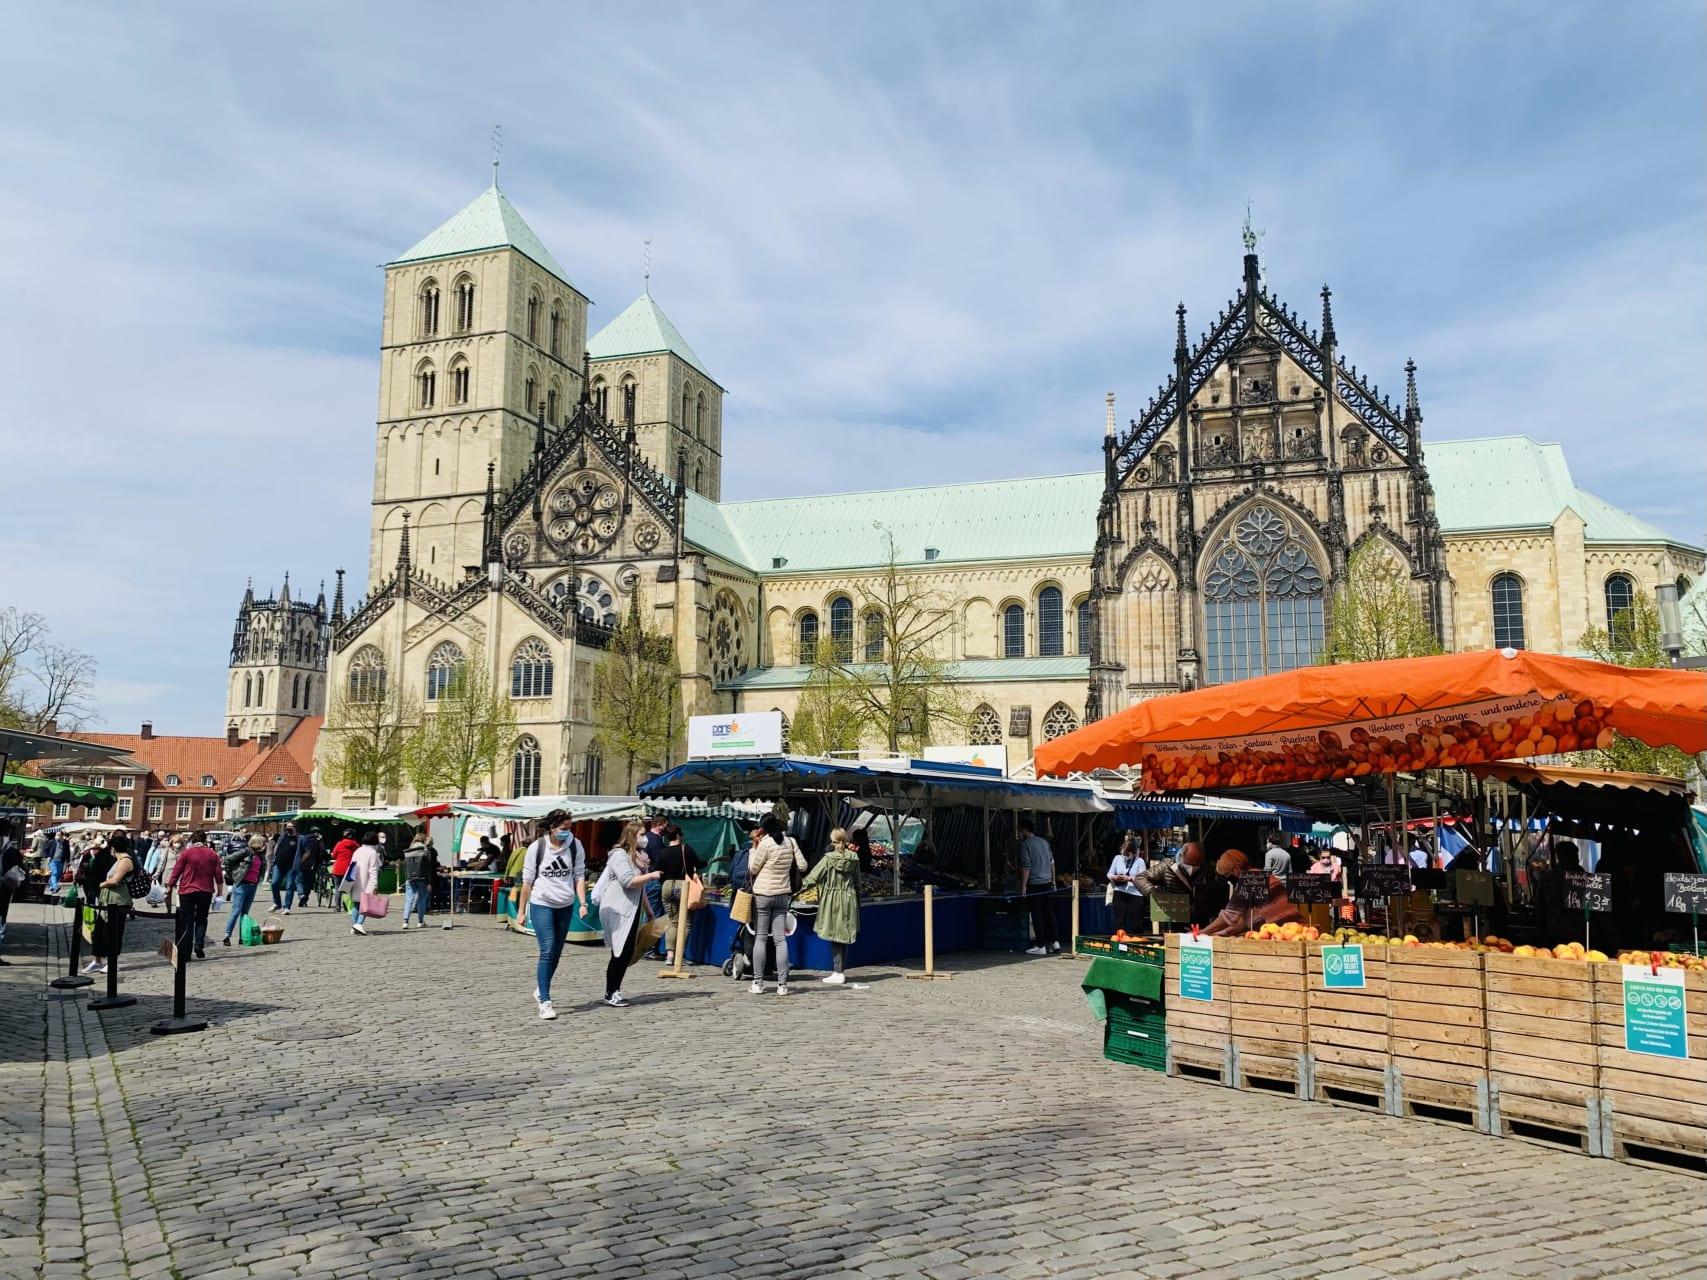 Munster - Market Tour of Medieval Town